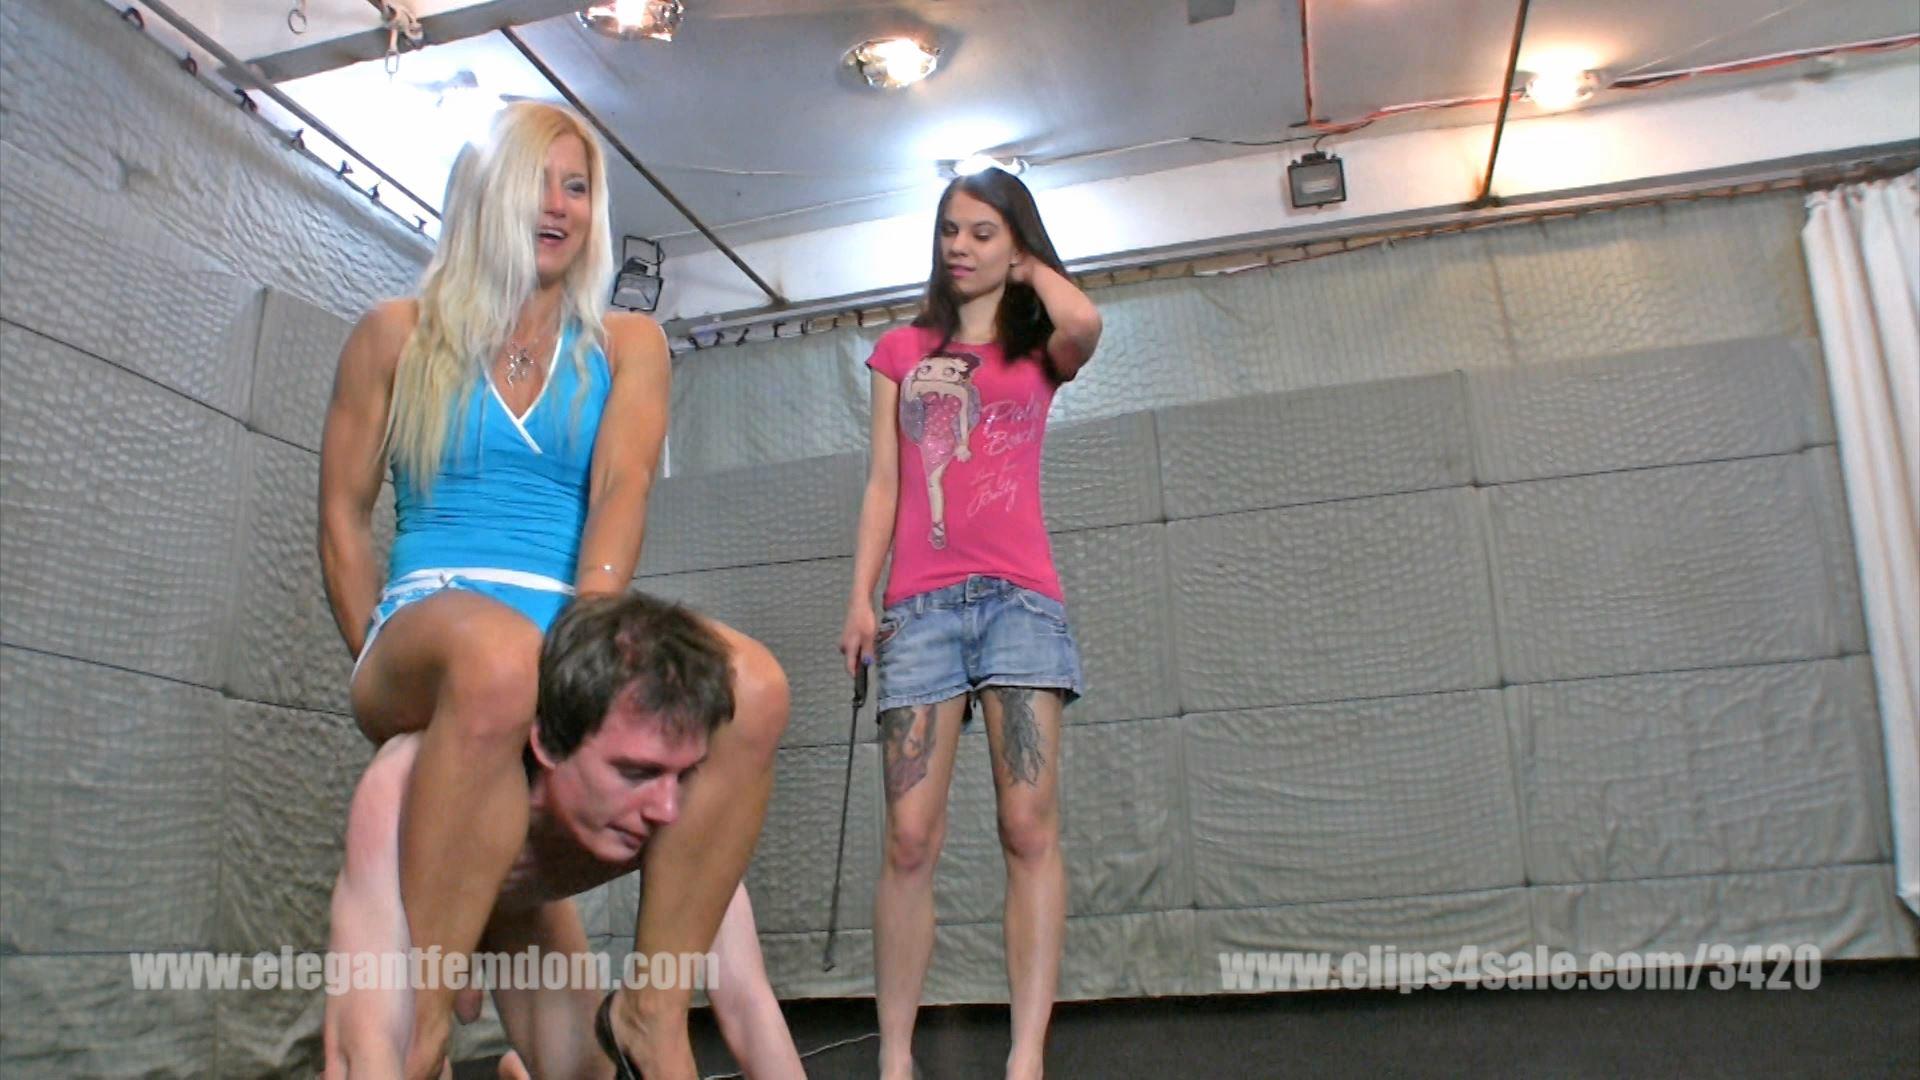 Two mistresses train the skinny weak male pony slave - ELEGANTFEMDOM - FULL HD/1080p/MP4